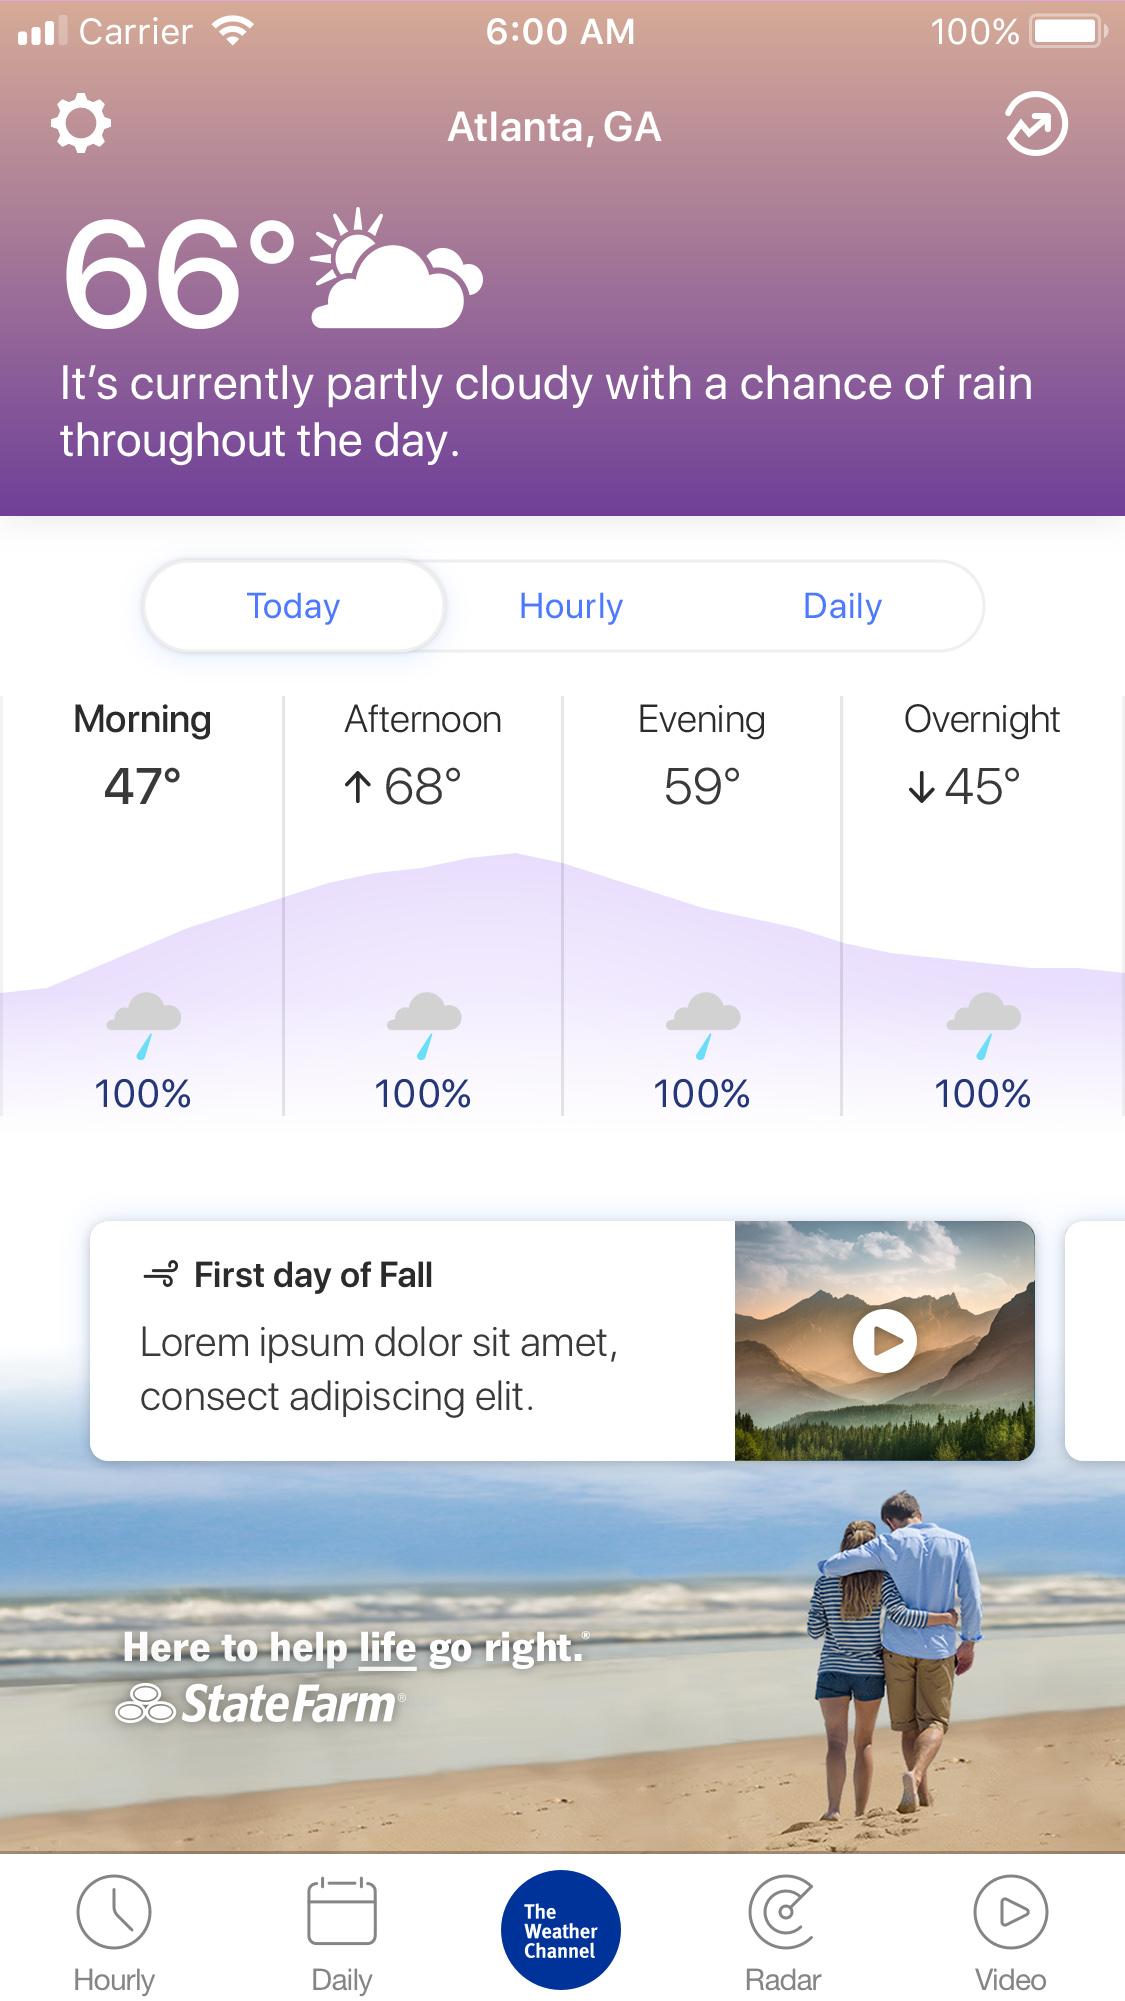 State_Farm_IM_003_Cloudy_Day_2